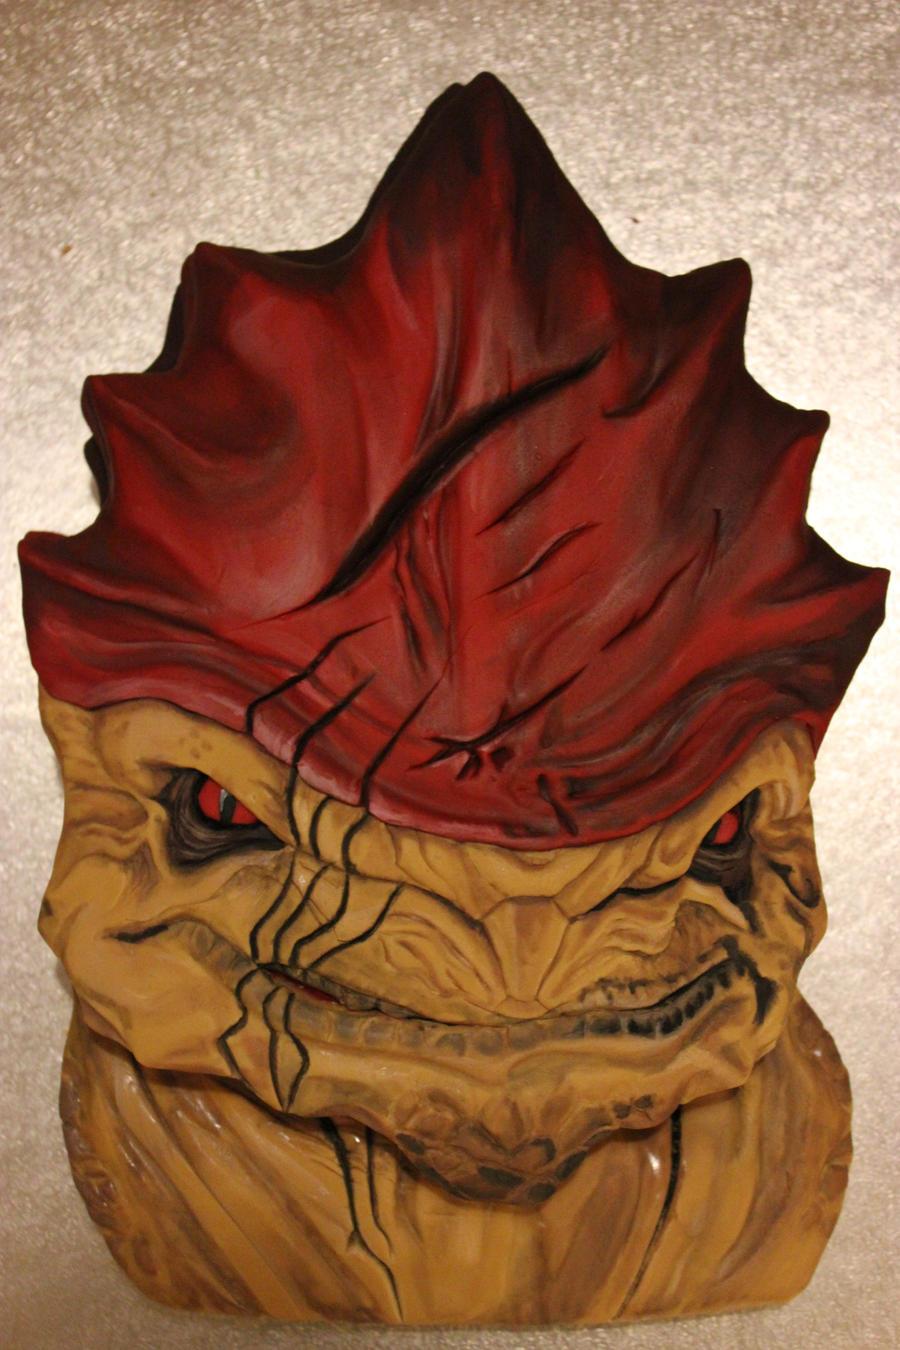 Wrex Cake by BeanieBat